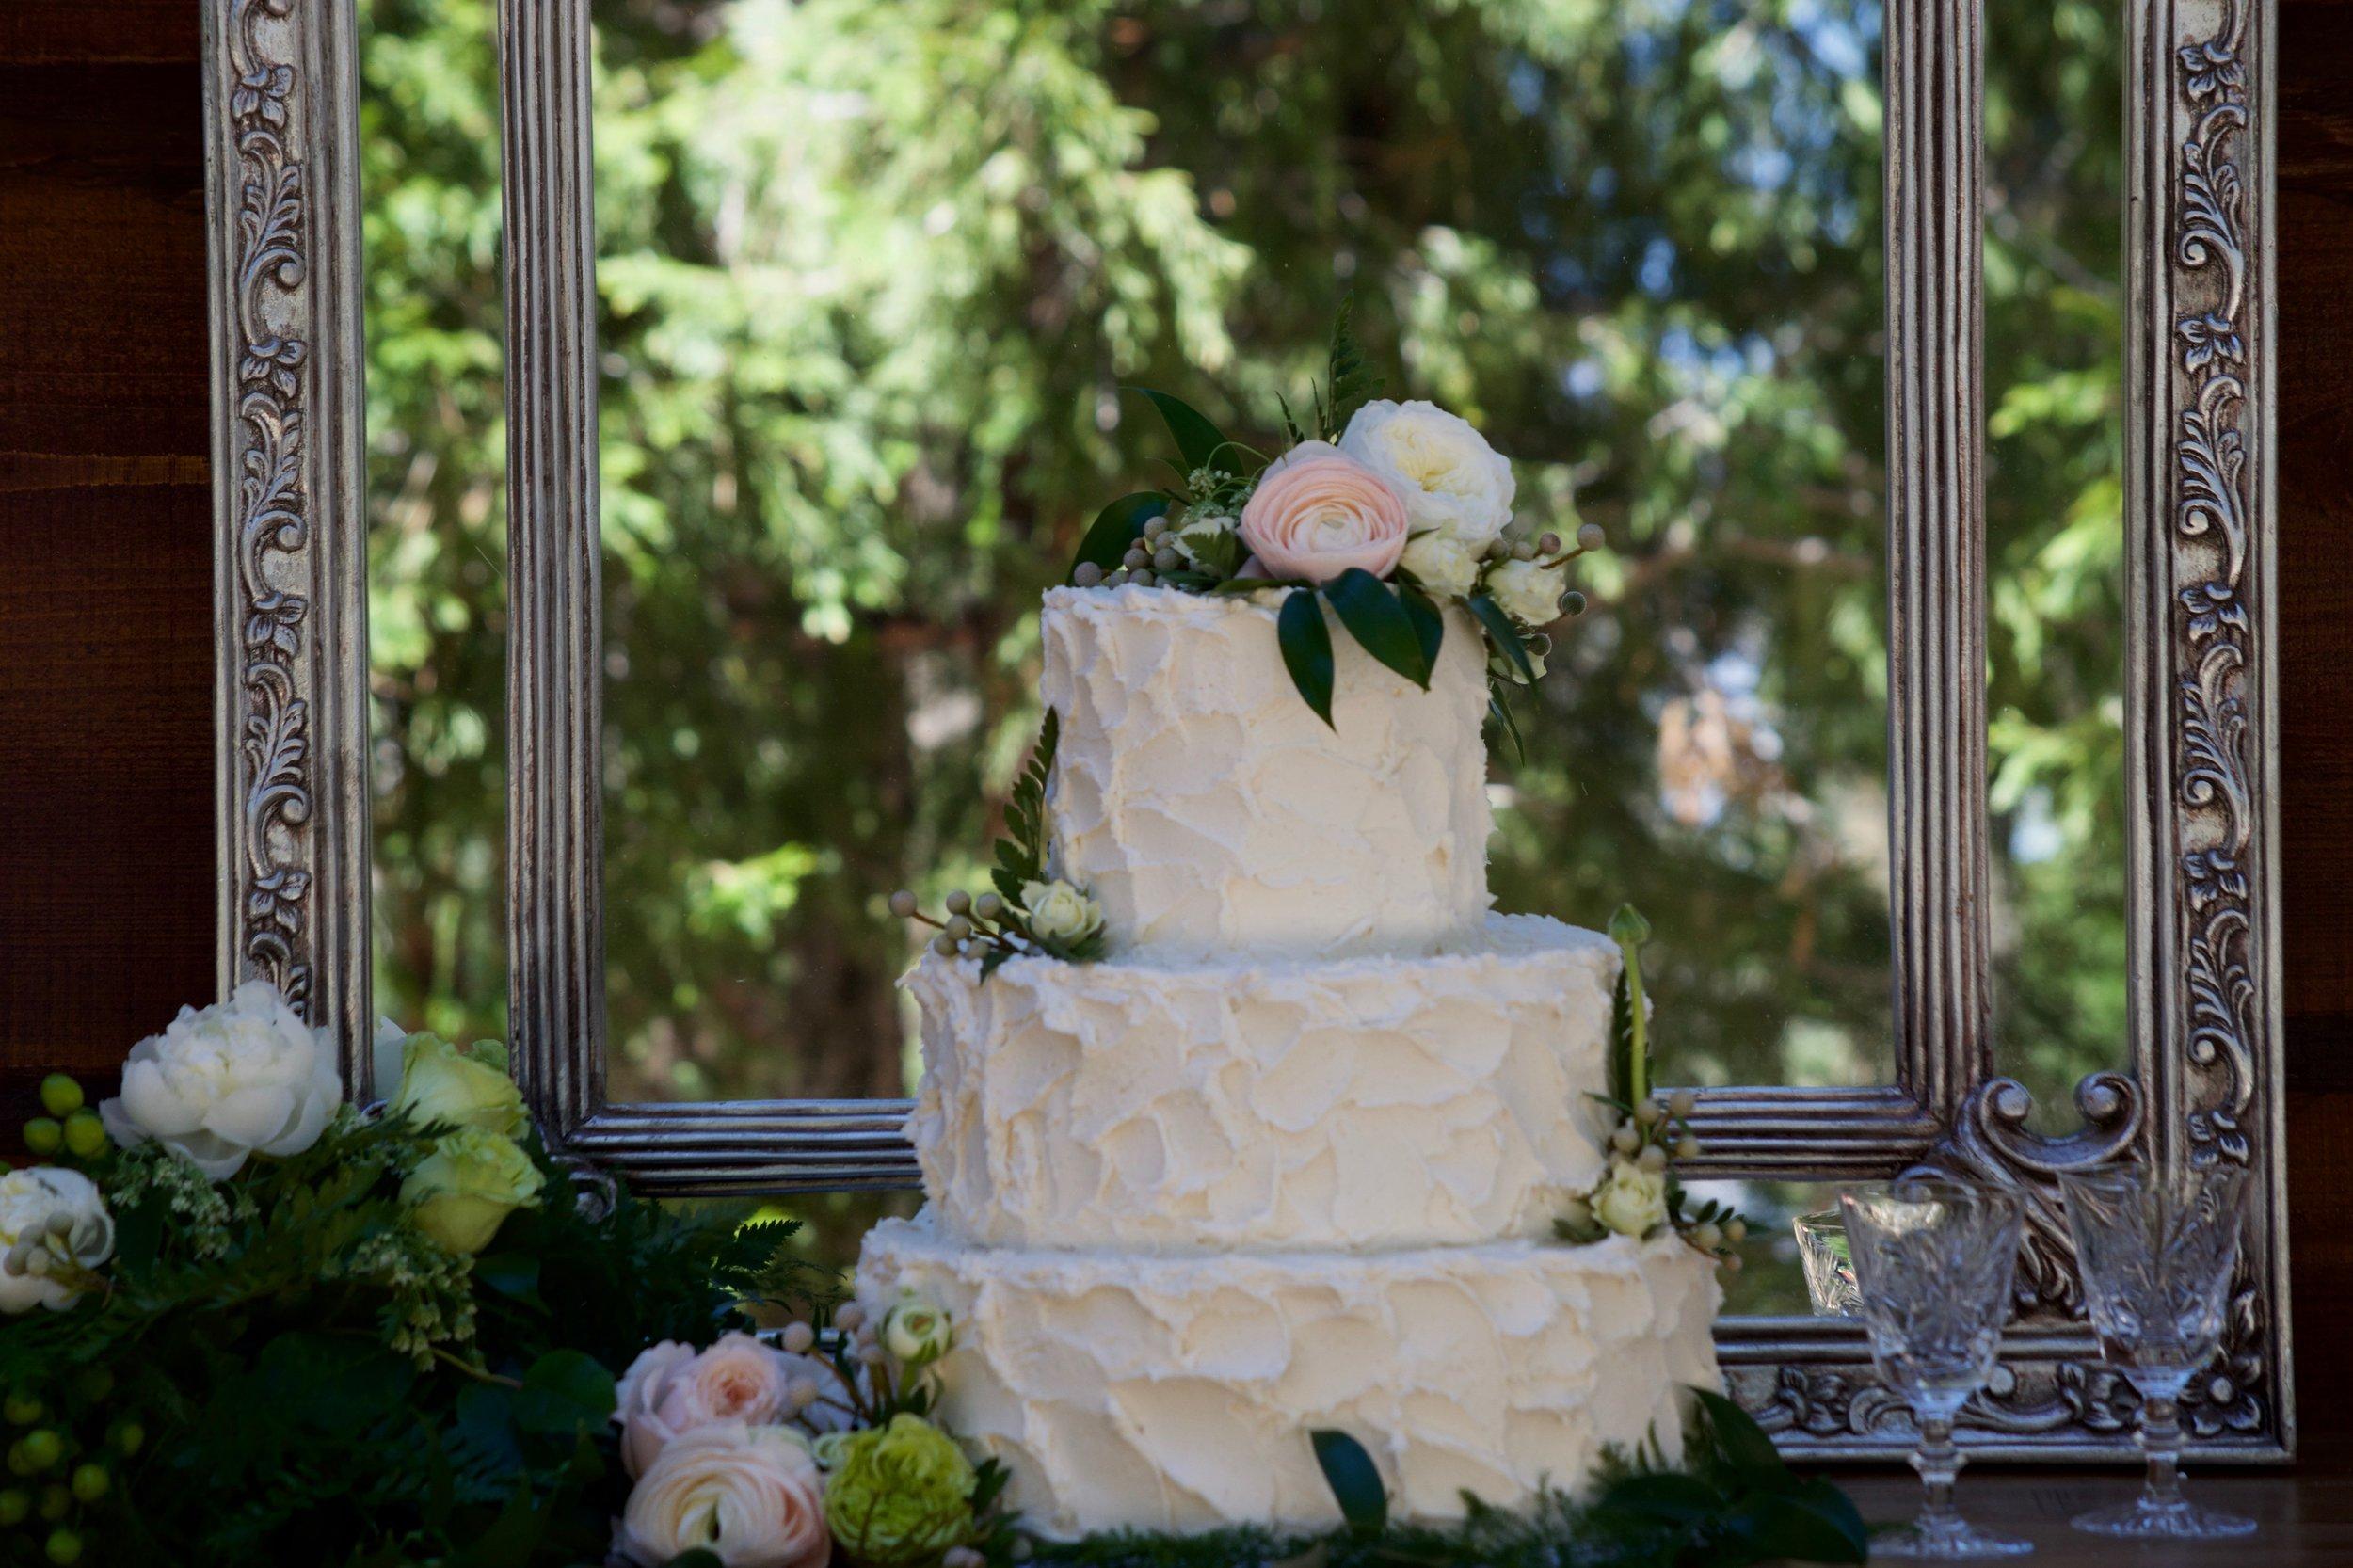 Wedding Cake_Photo Shoot.jpg